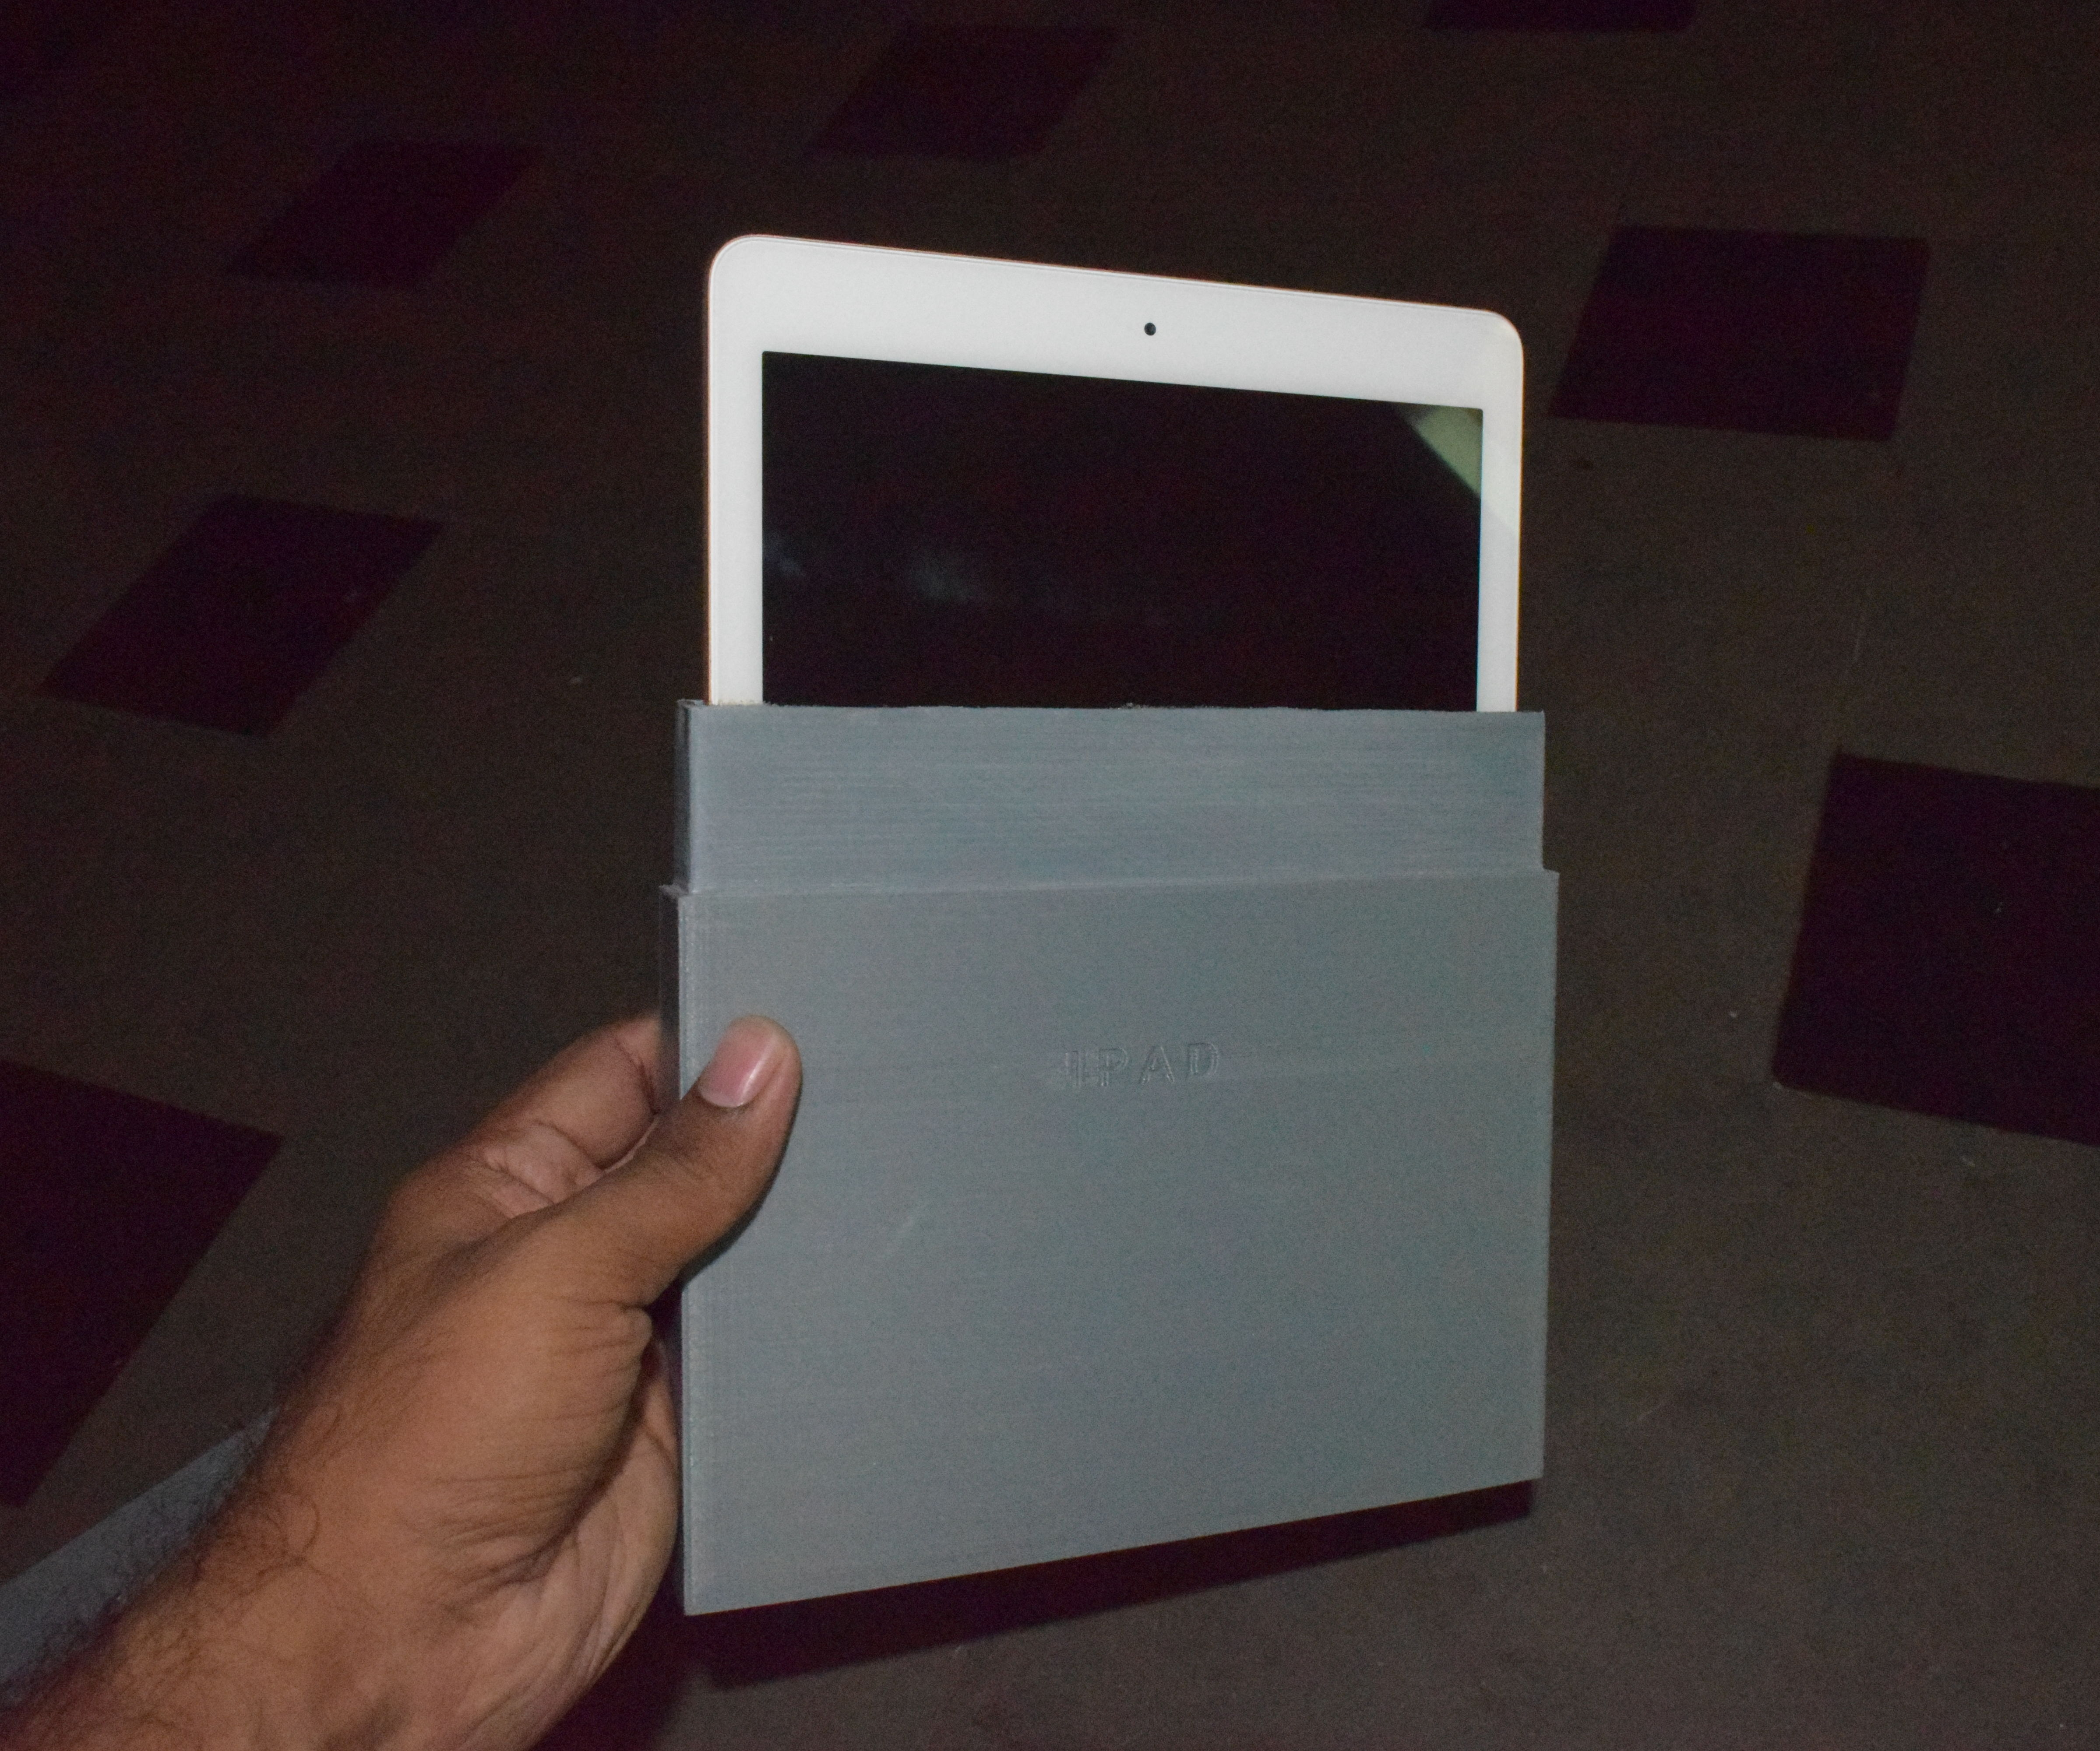 3D Printed Ipad Case